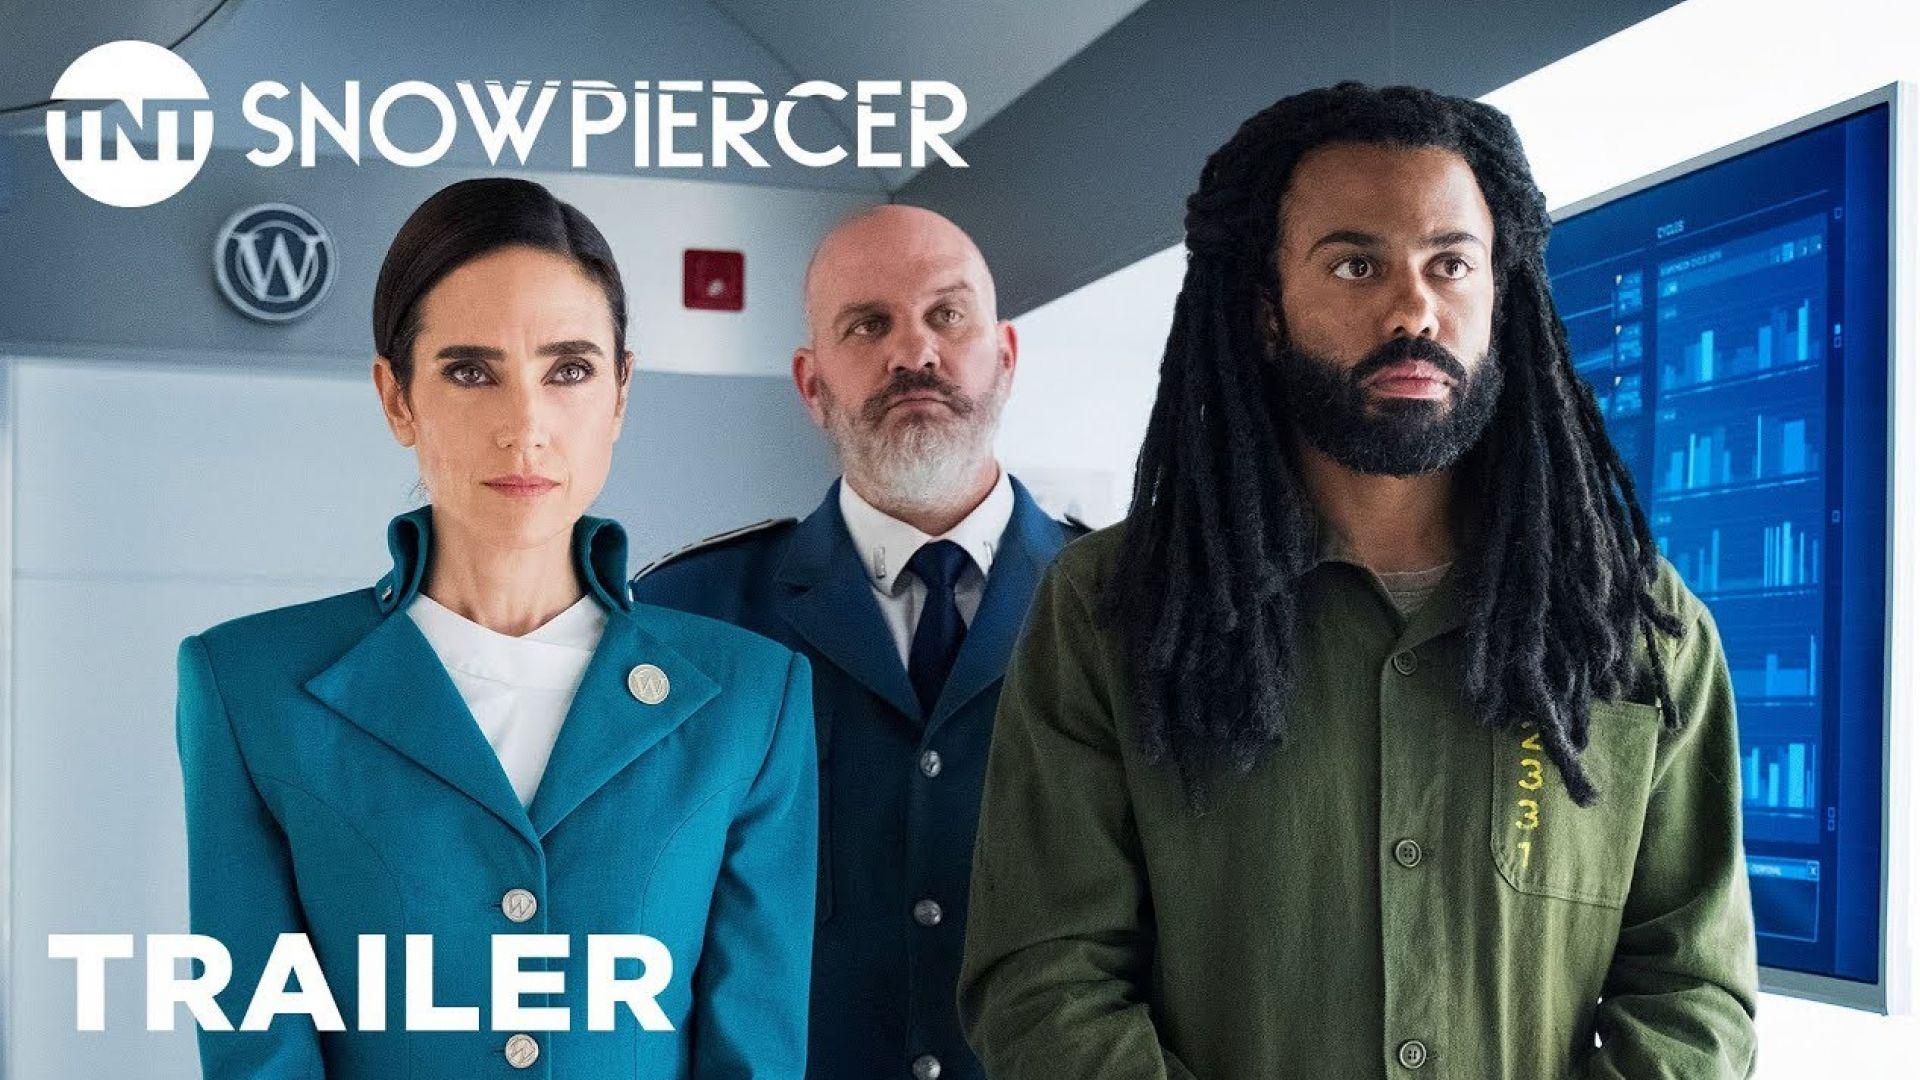 Snowpiercer Series Trailer (TNT)